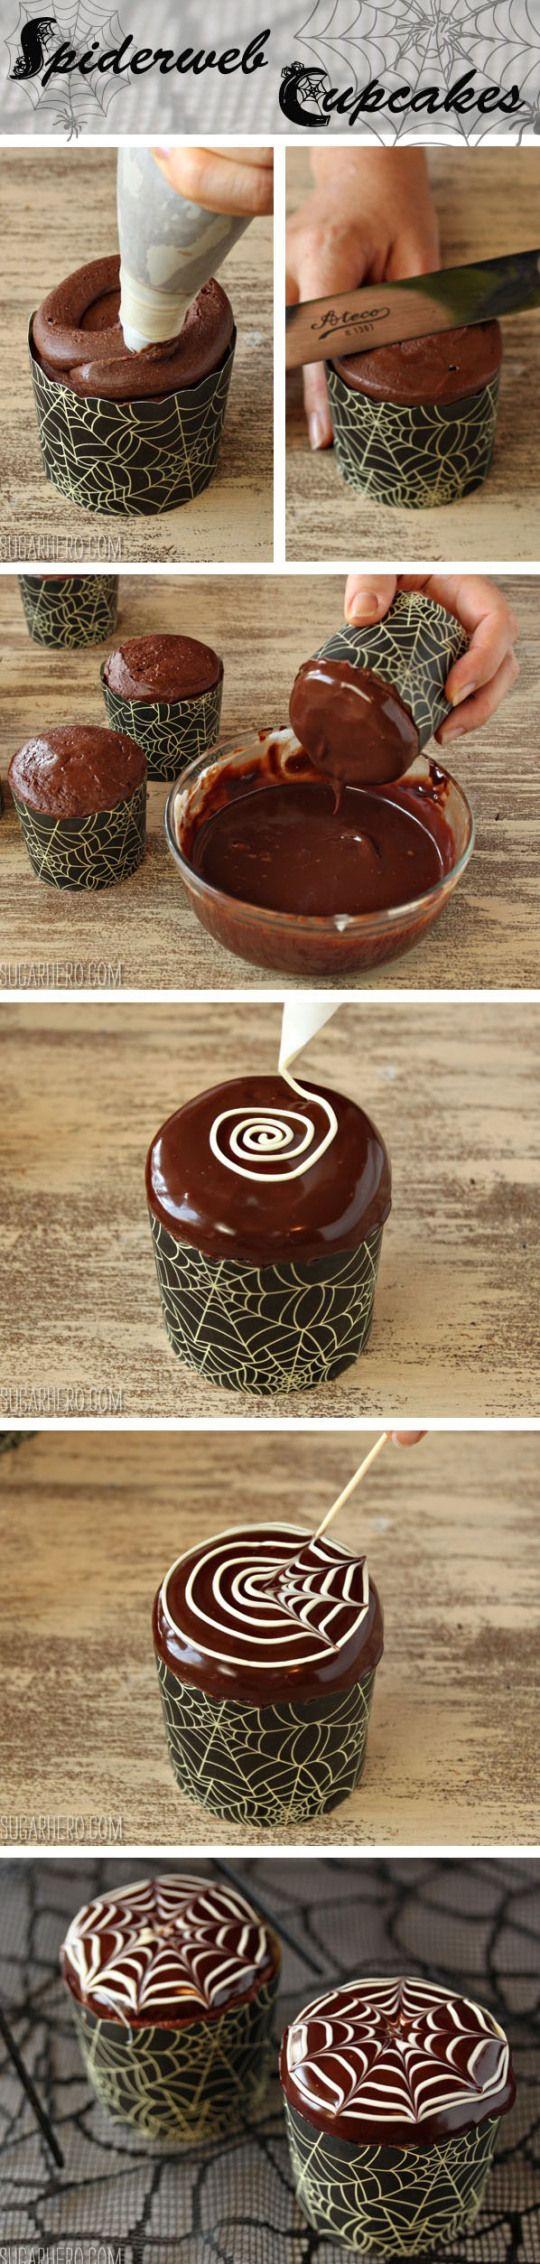 Spiderweb Cupcakes with Chocolate Spiders | SugarHero.com